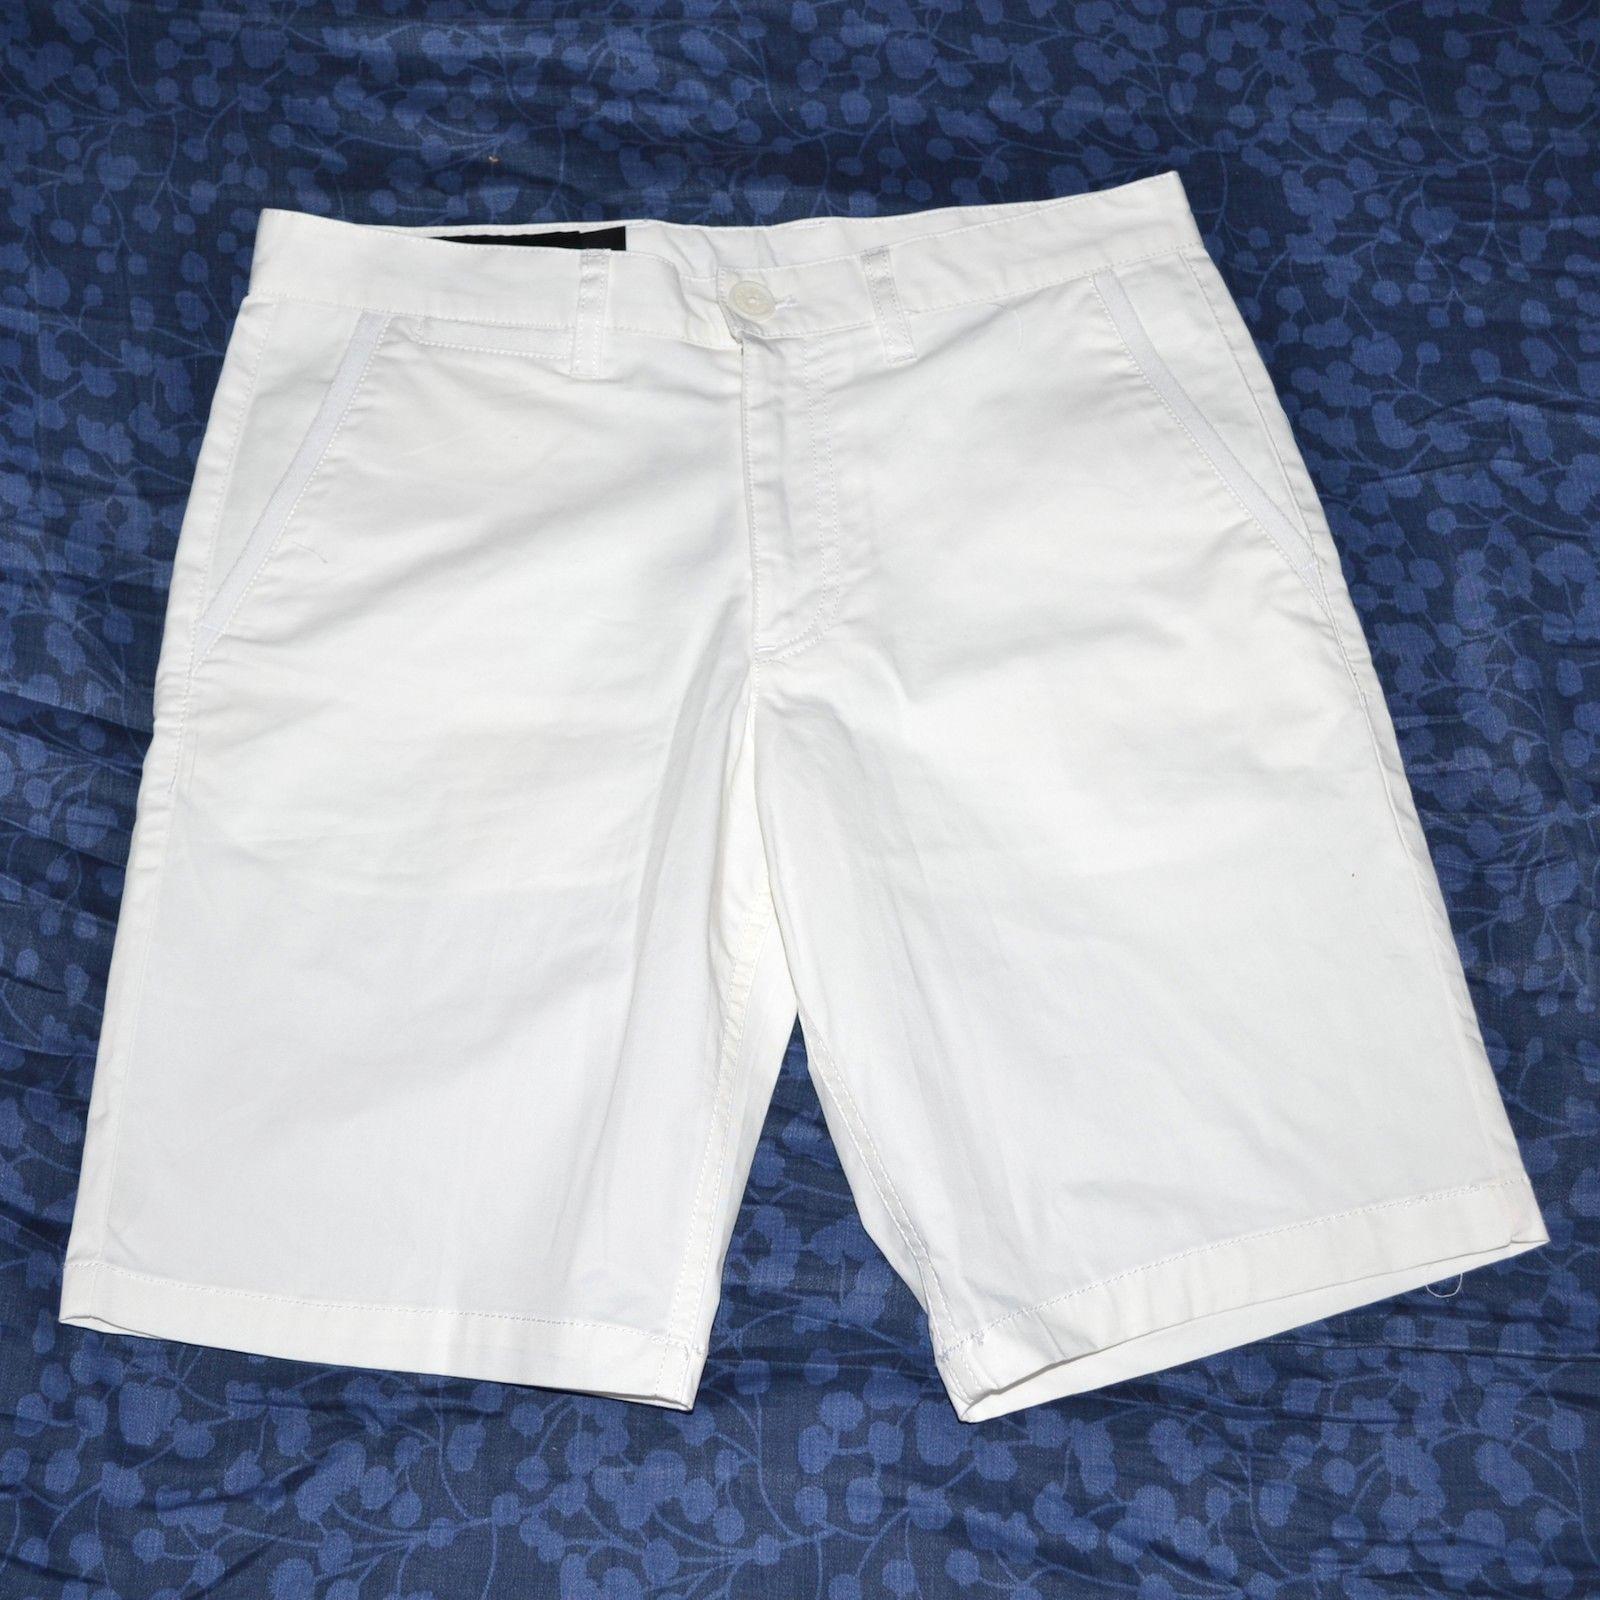 0d04c344831f Armani Exchange A-X short bermuda blanc and similar items. 57